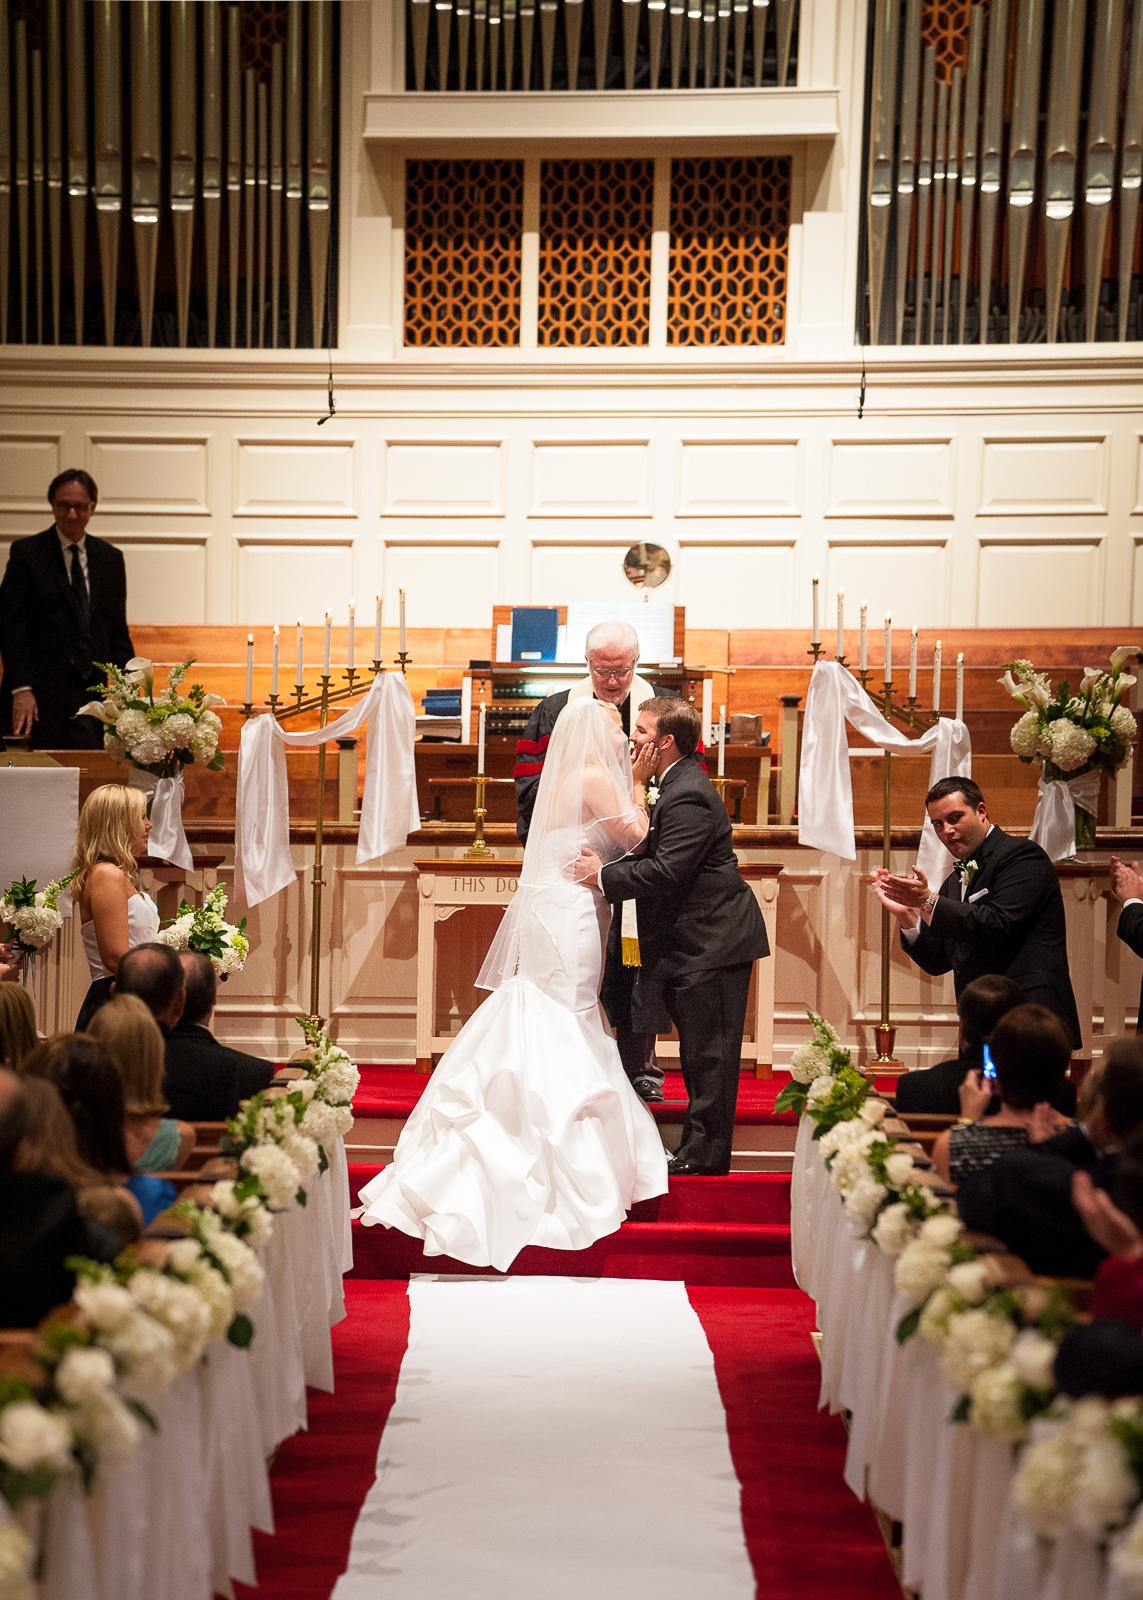 Michael-Napier-Weddings-Cogill-Bizzle-Album-2 (34).jpg